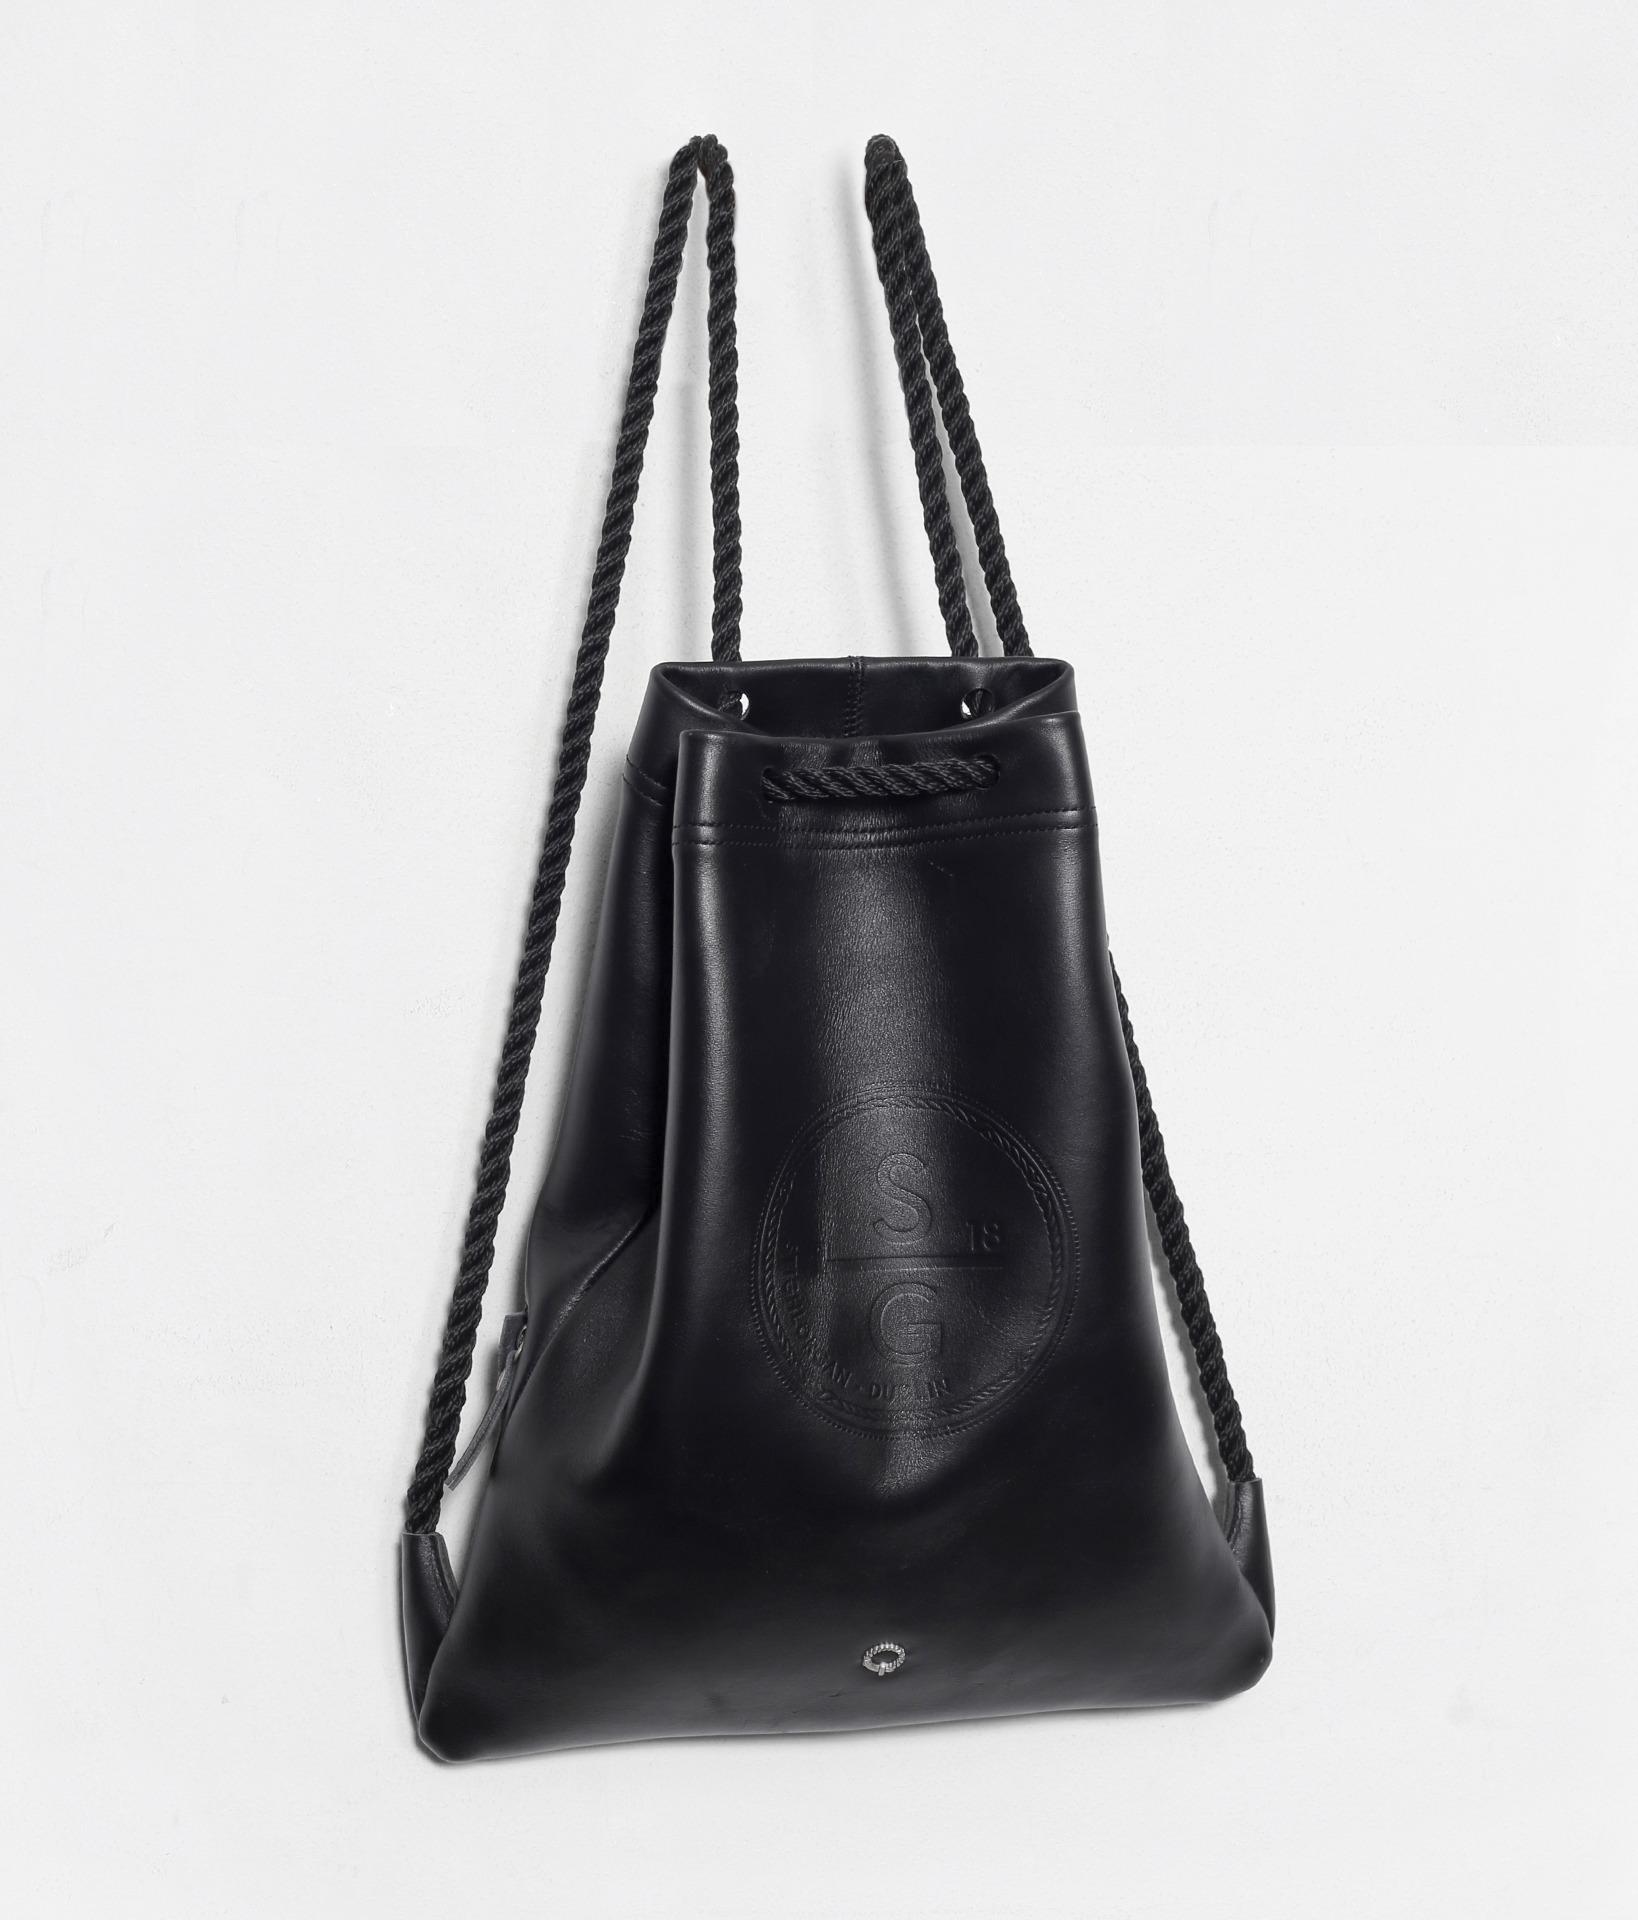 Stighlorgan Driscoll Leather Drawstring Bag